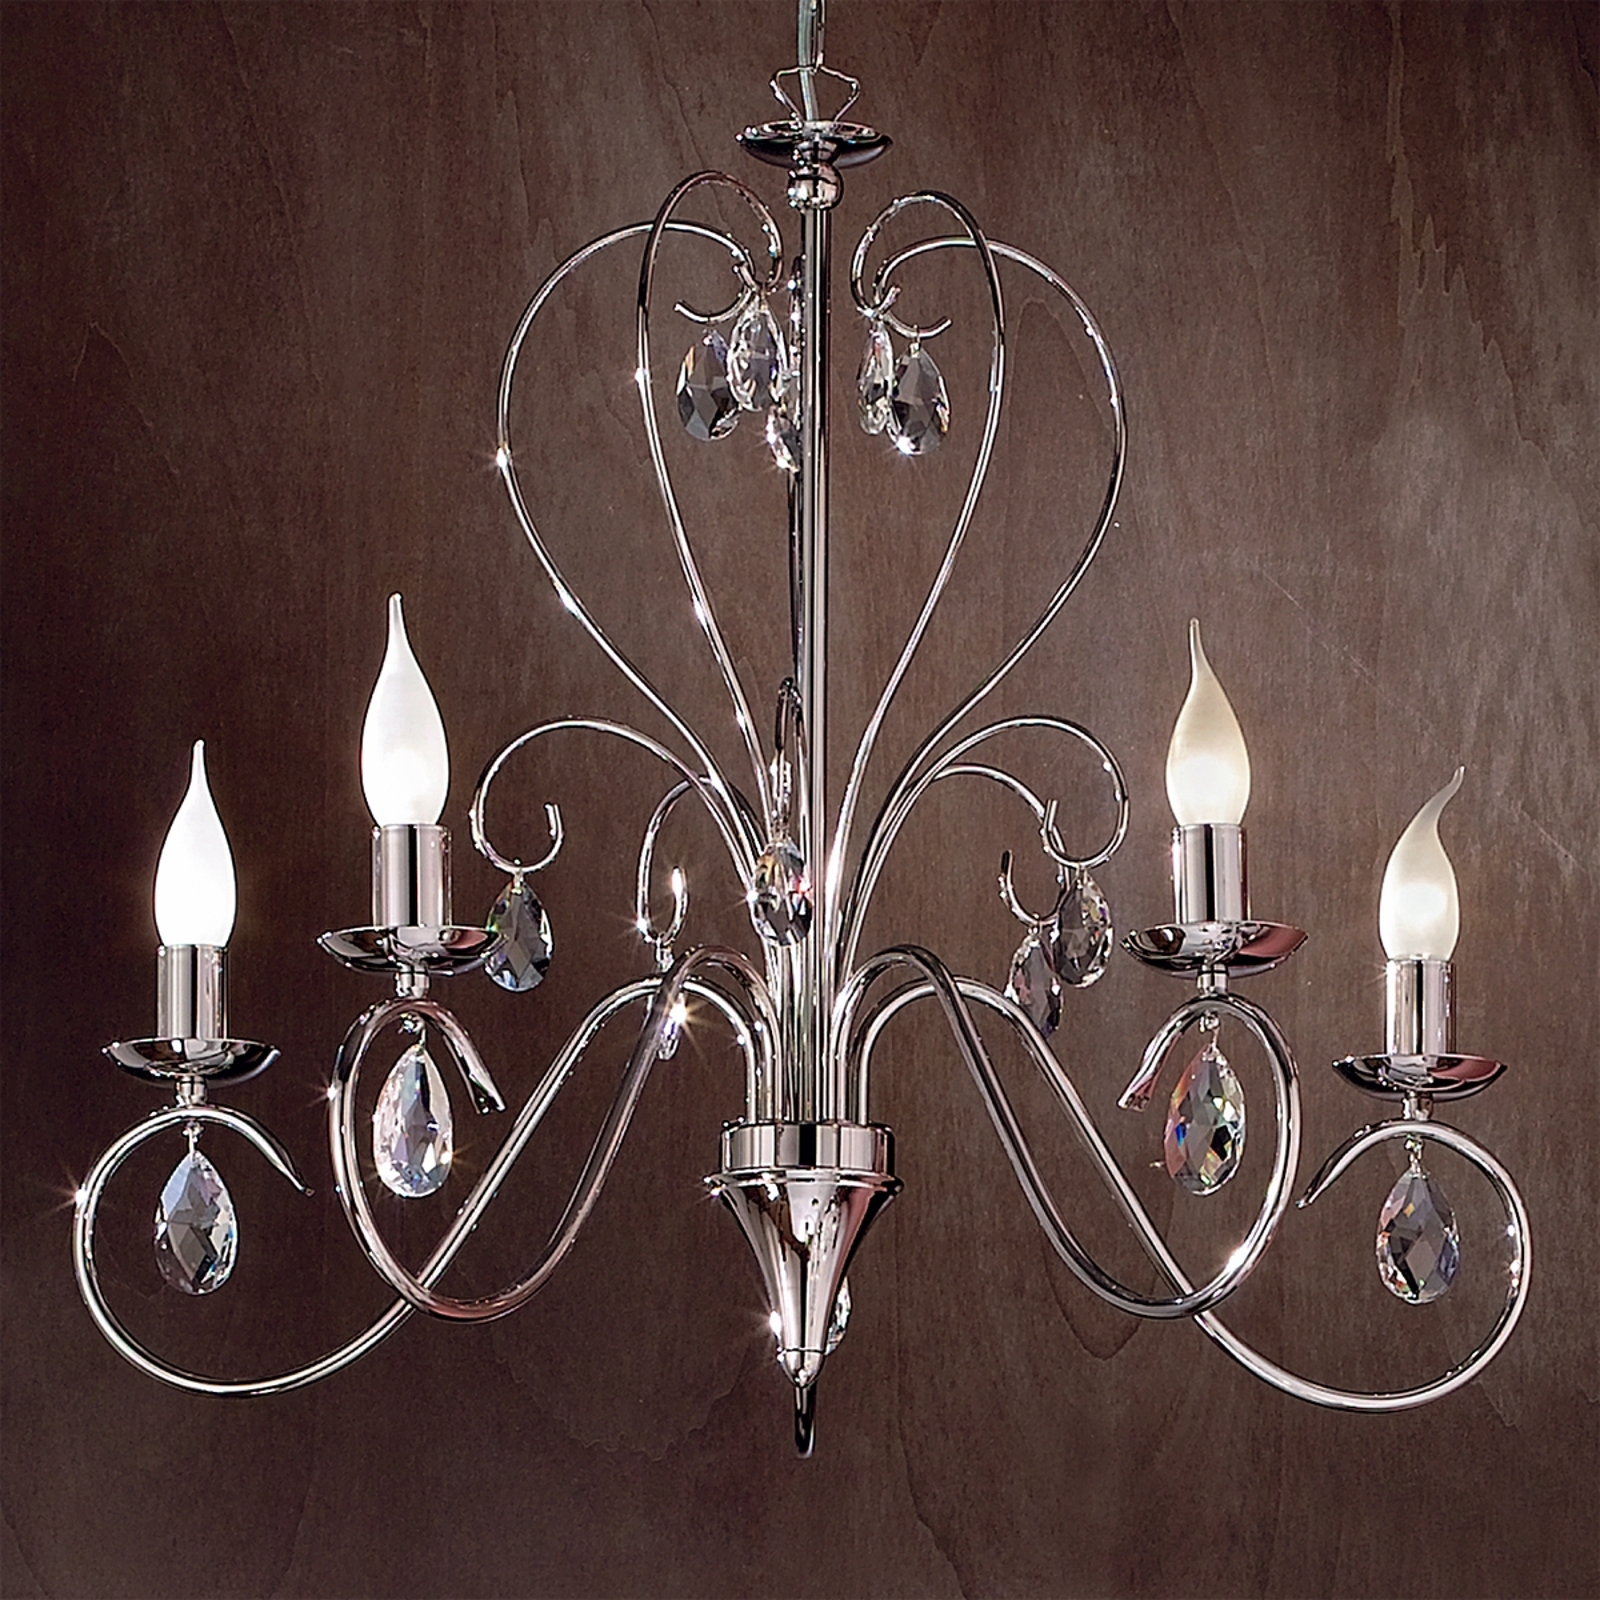 Kattokruunu Fioretto Asfour-kristallia, 5-lamppua